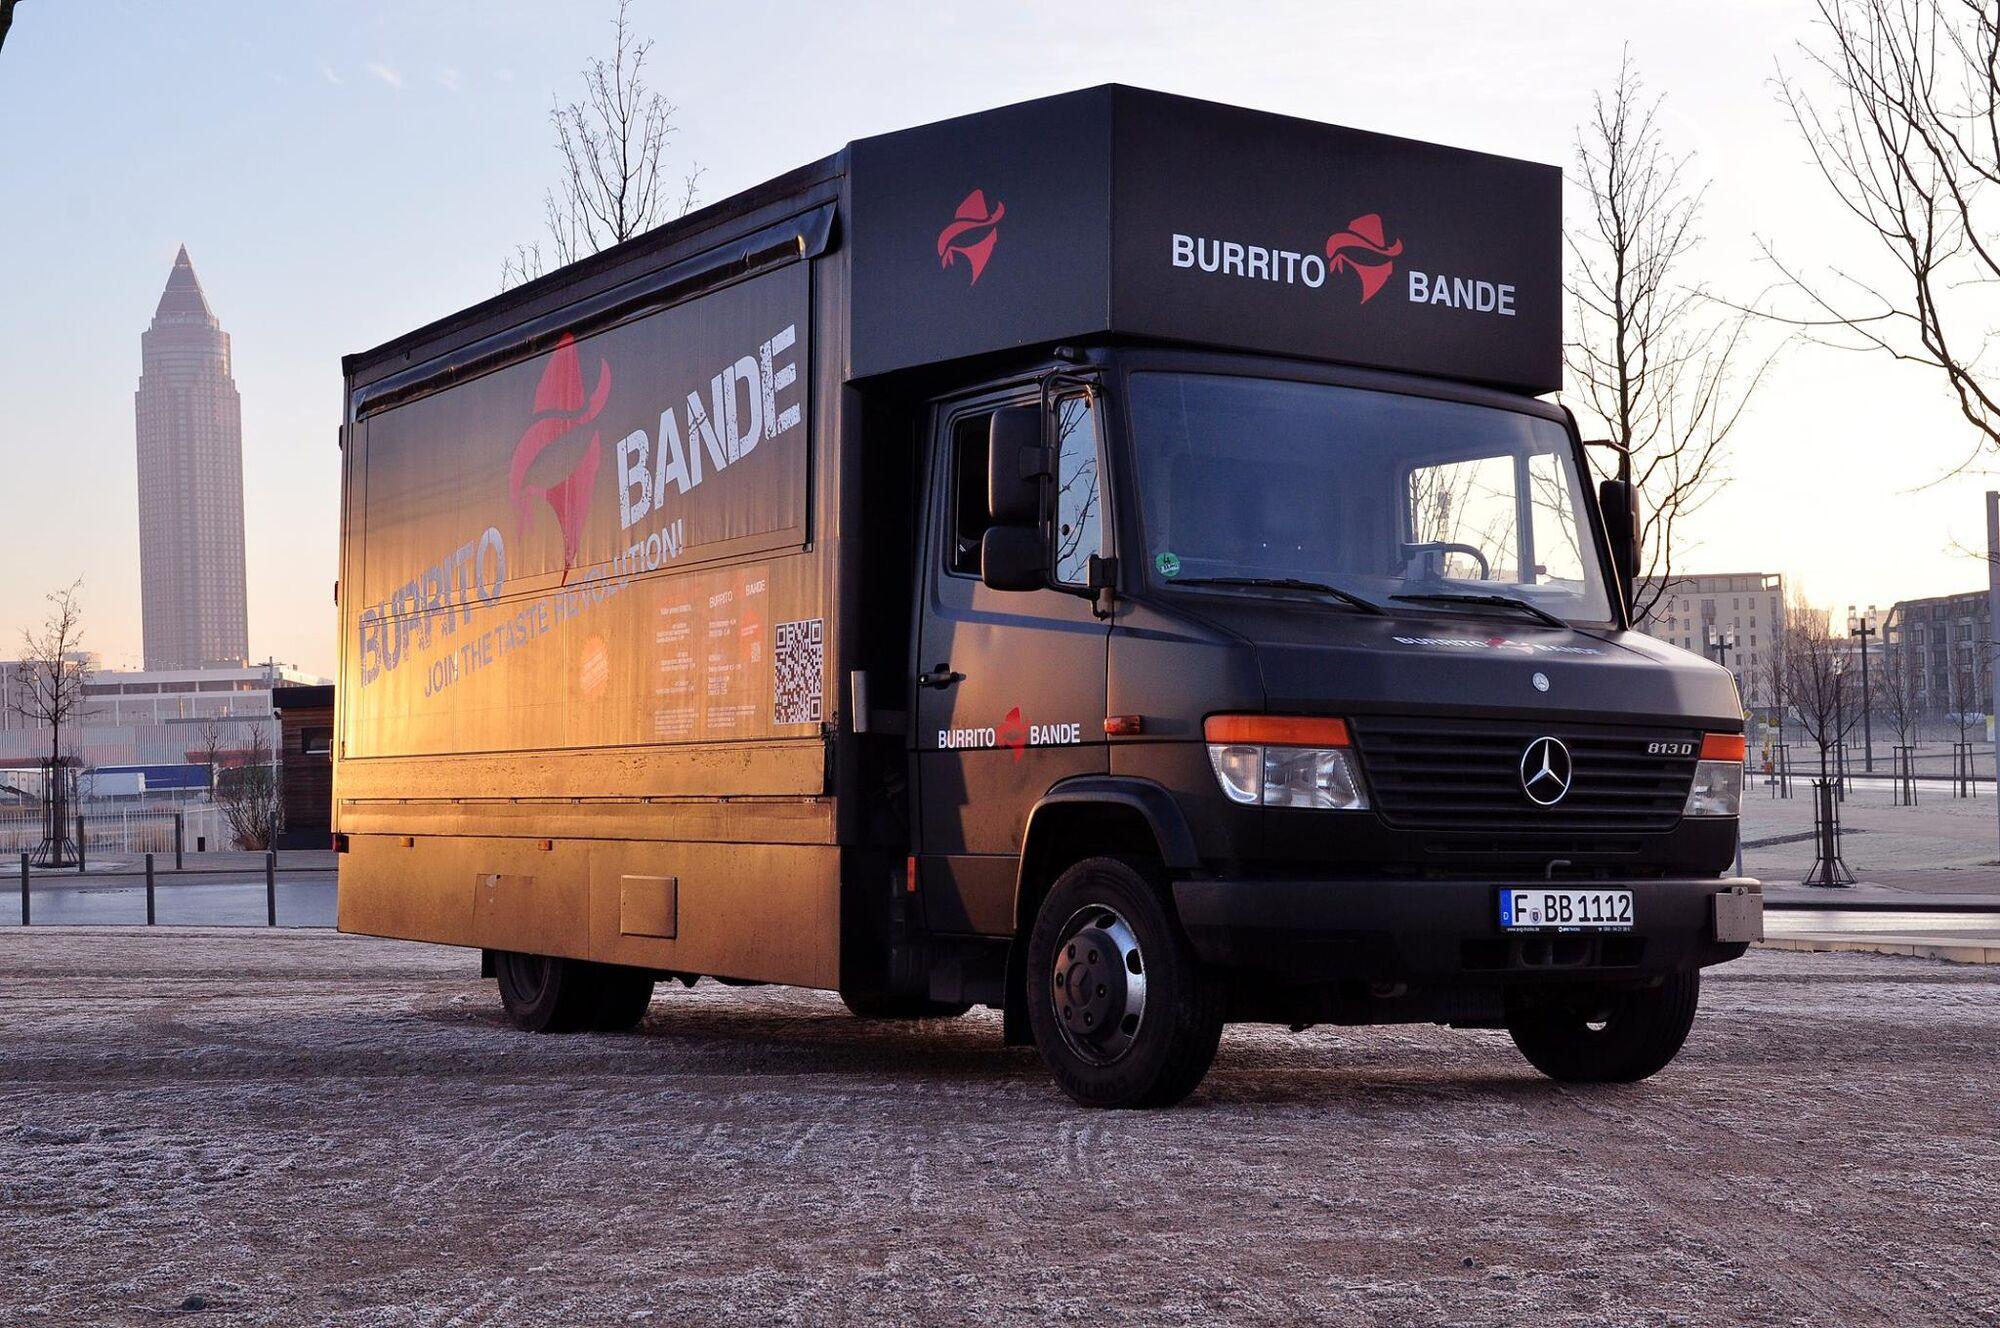 burrito bande food truck wikia fandom powered by wikia. Black Bedroom Furniture Sets. Home Design Ideas